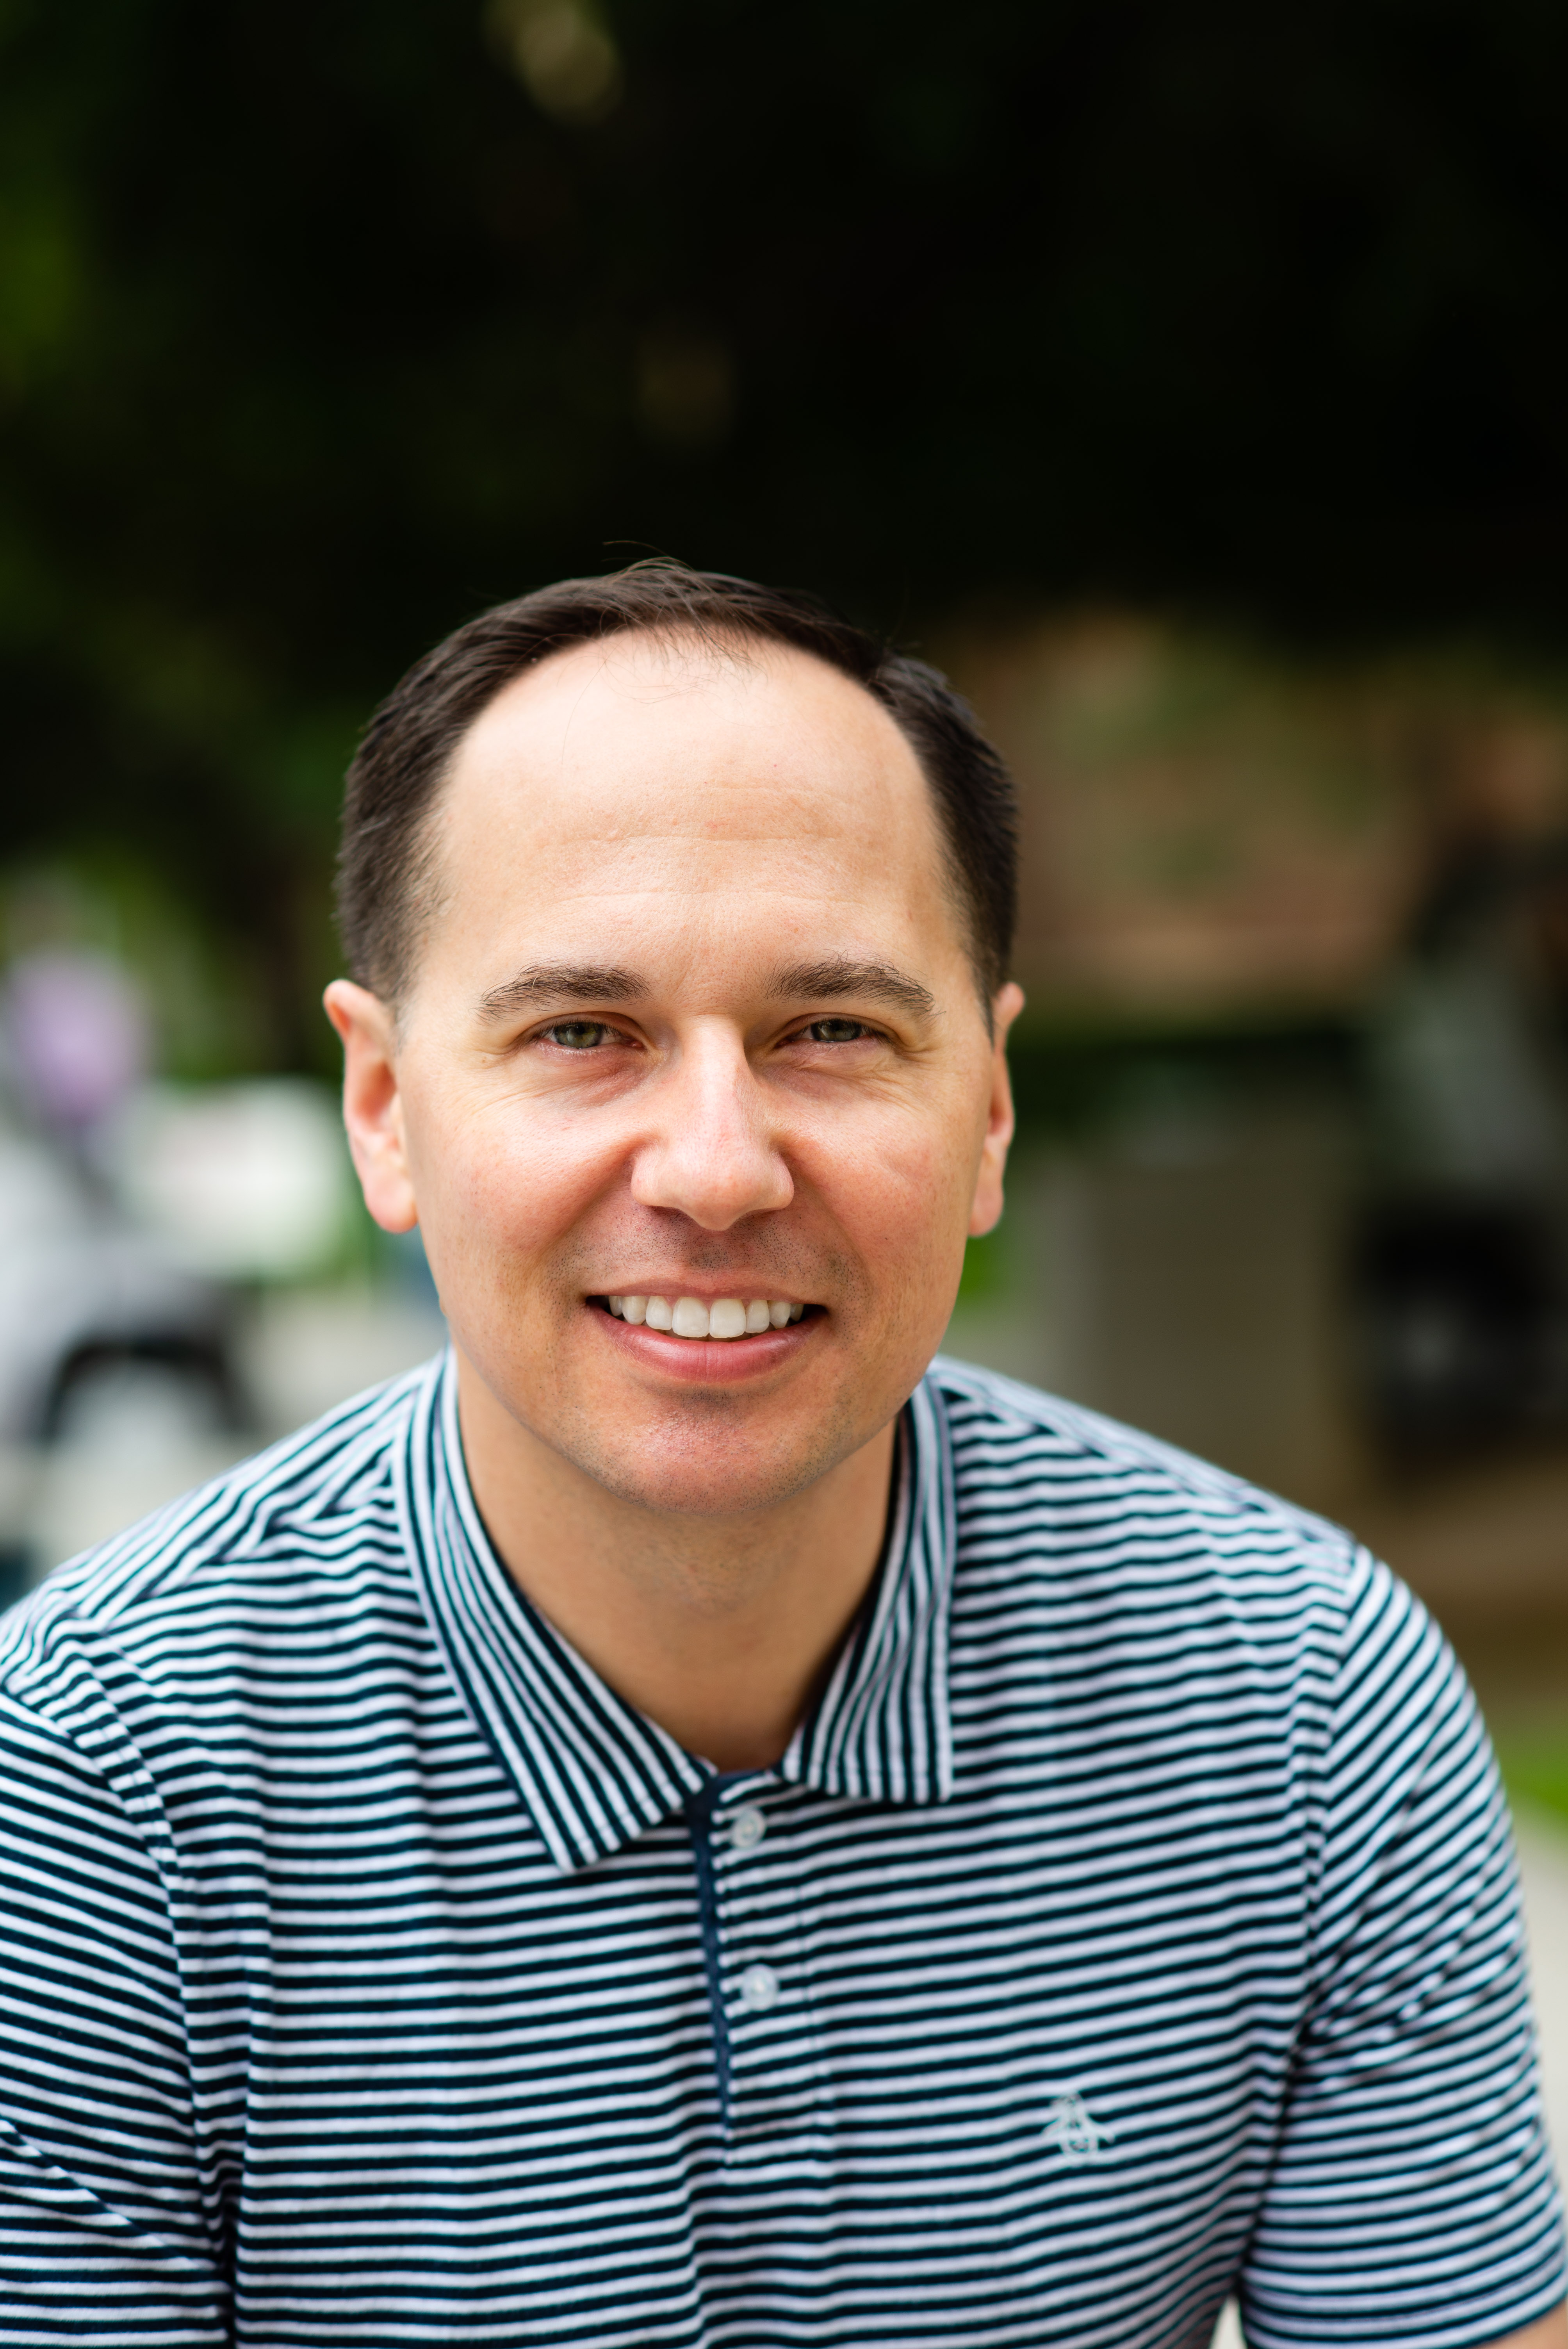 Headshot of a white man in a blue striped polo shirt